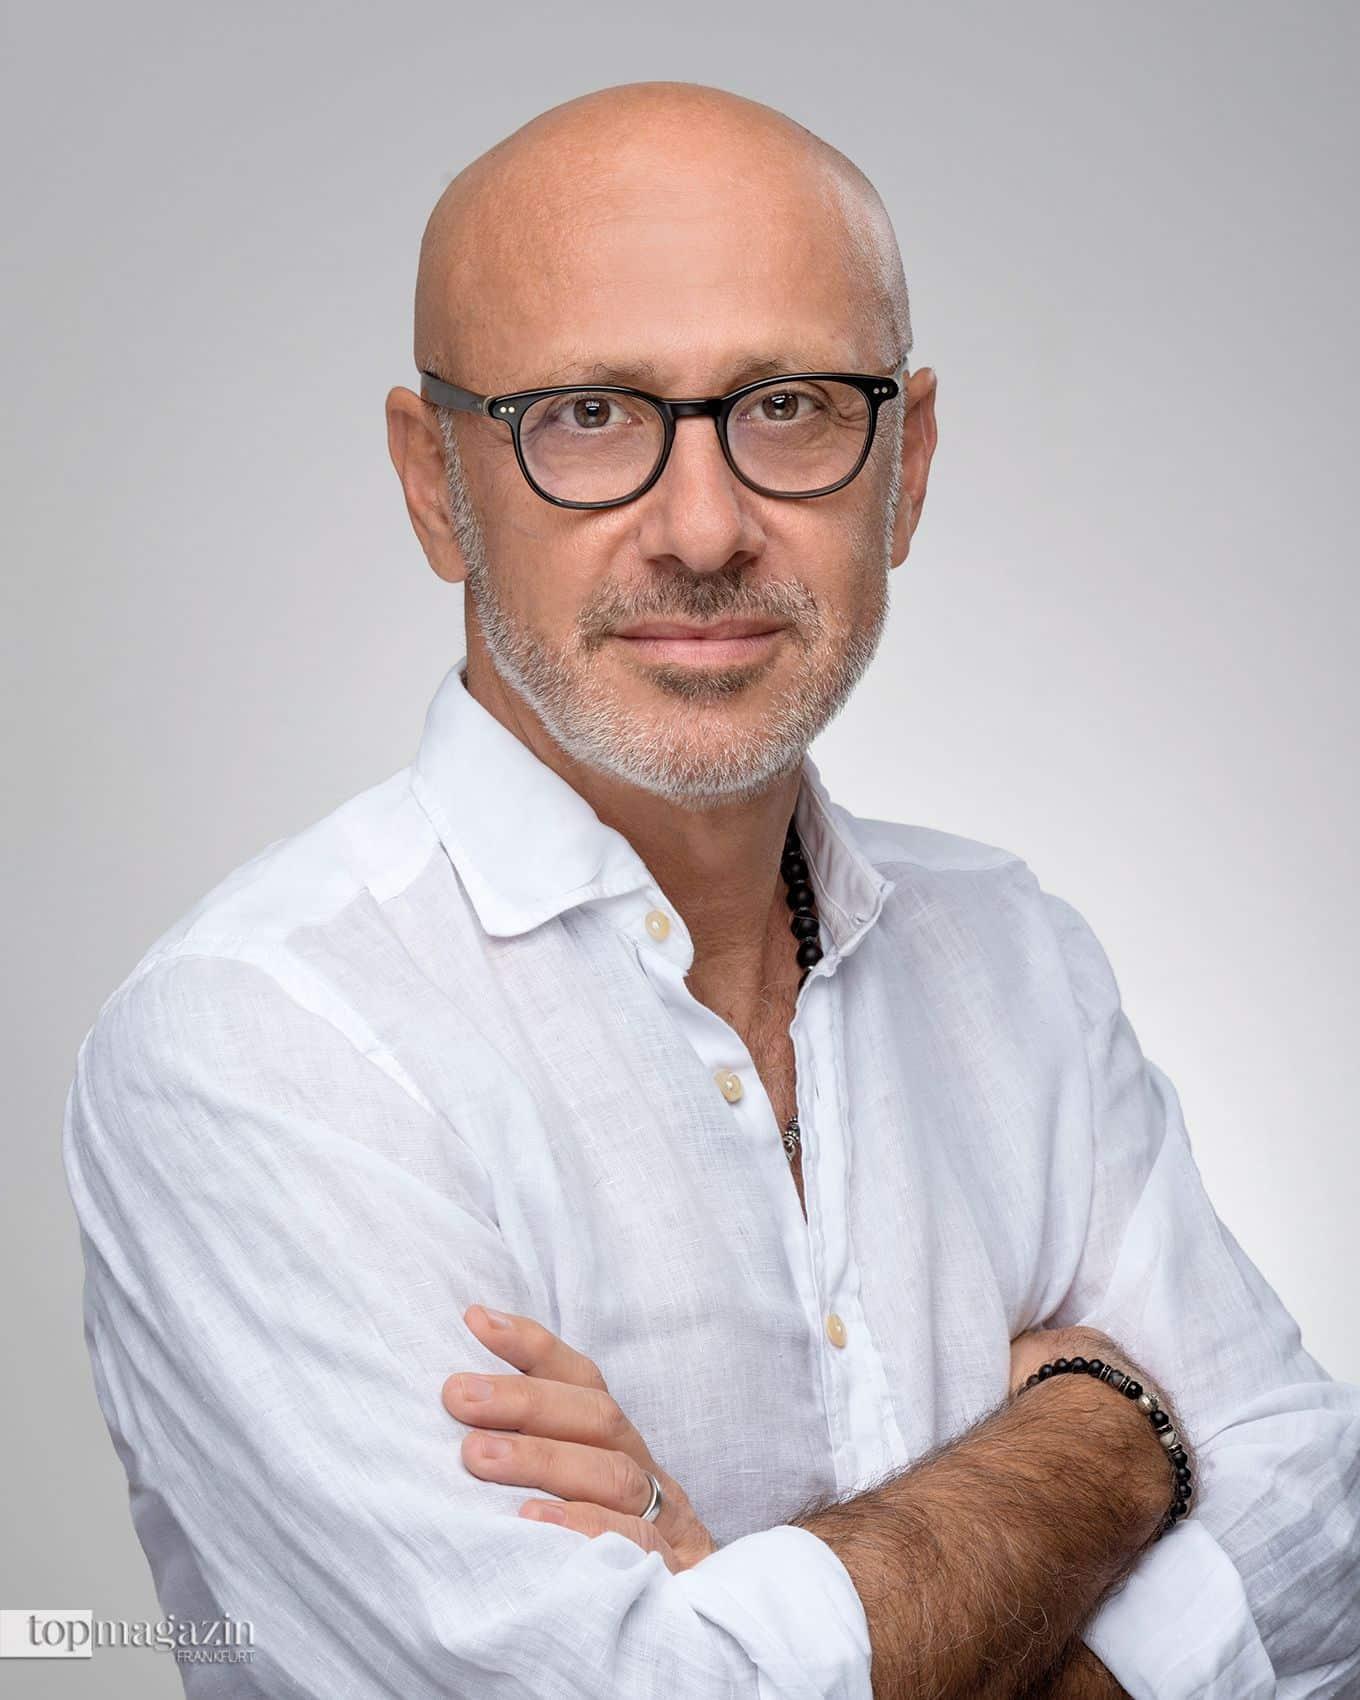 Dr. Andre Rotmann